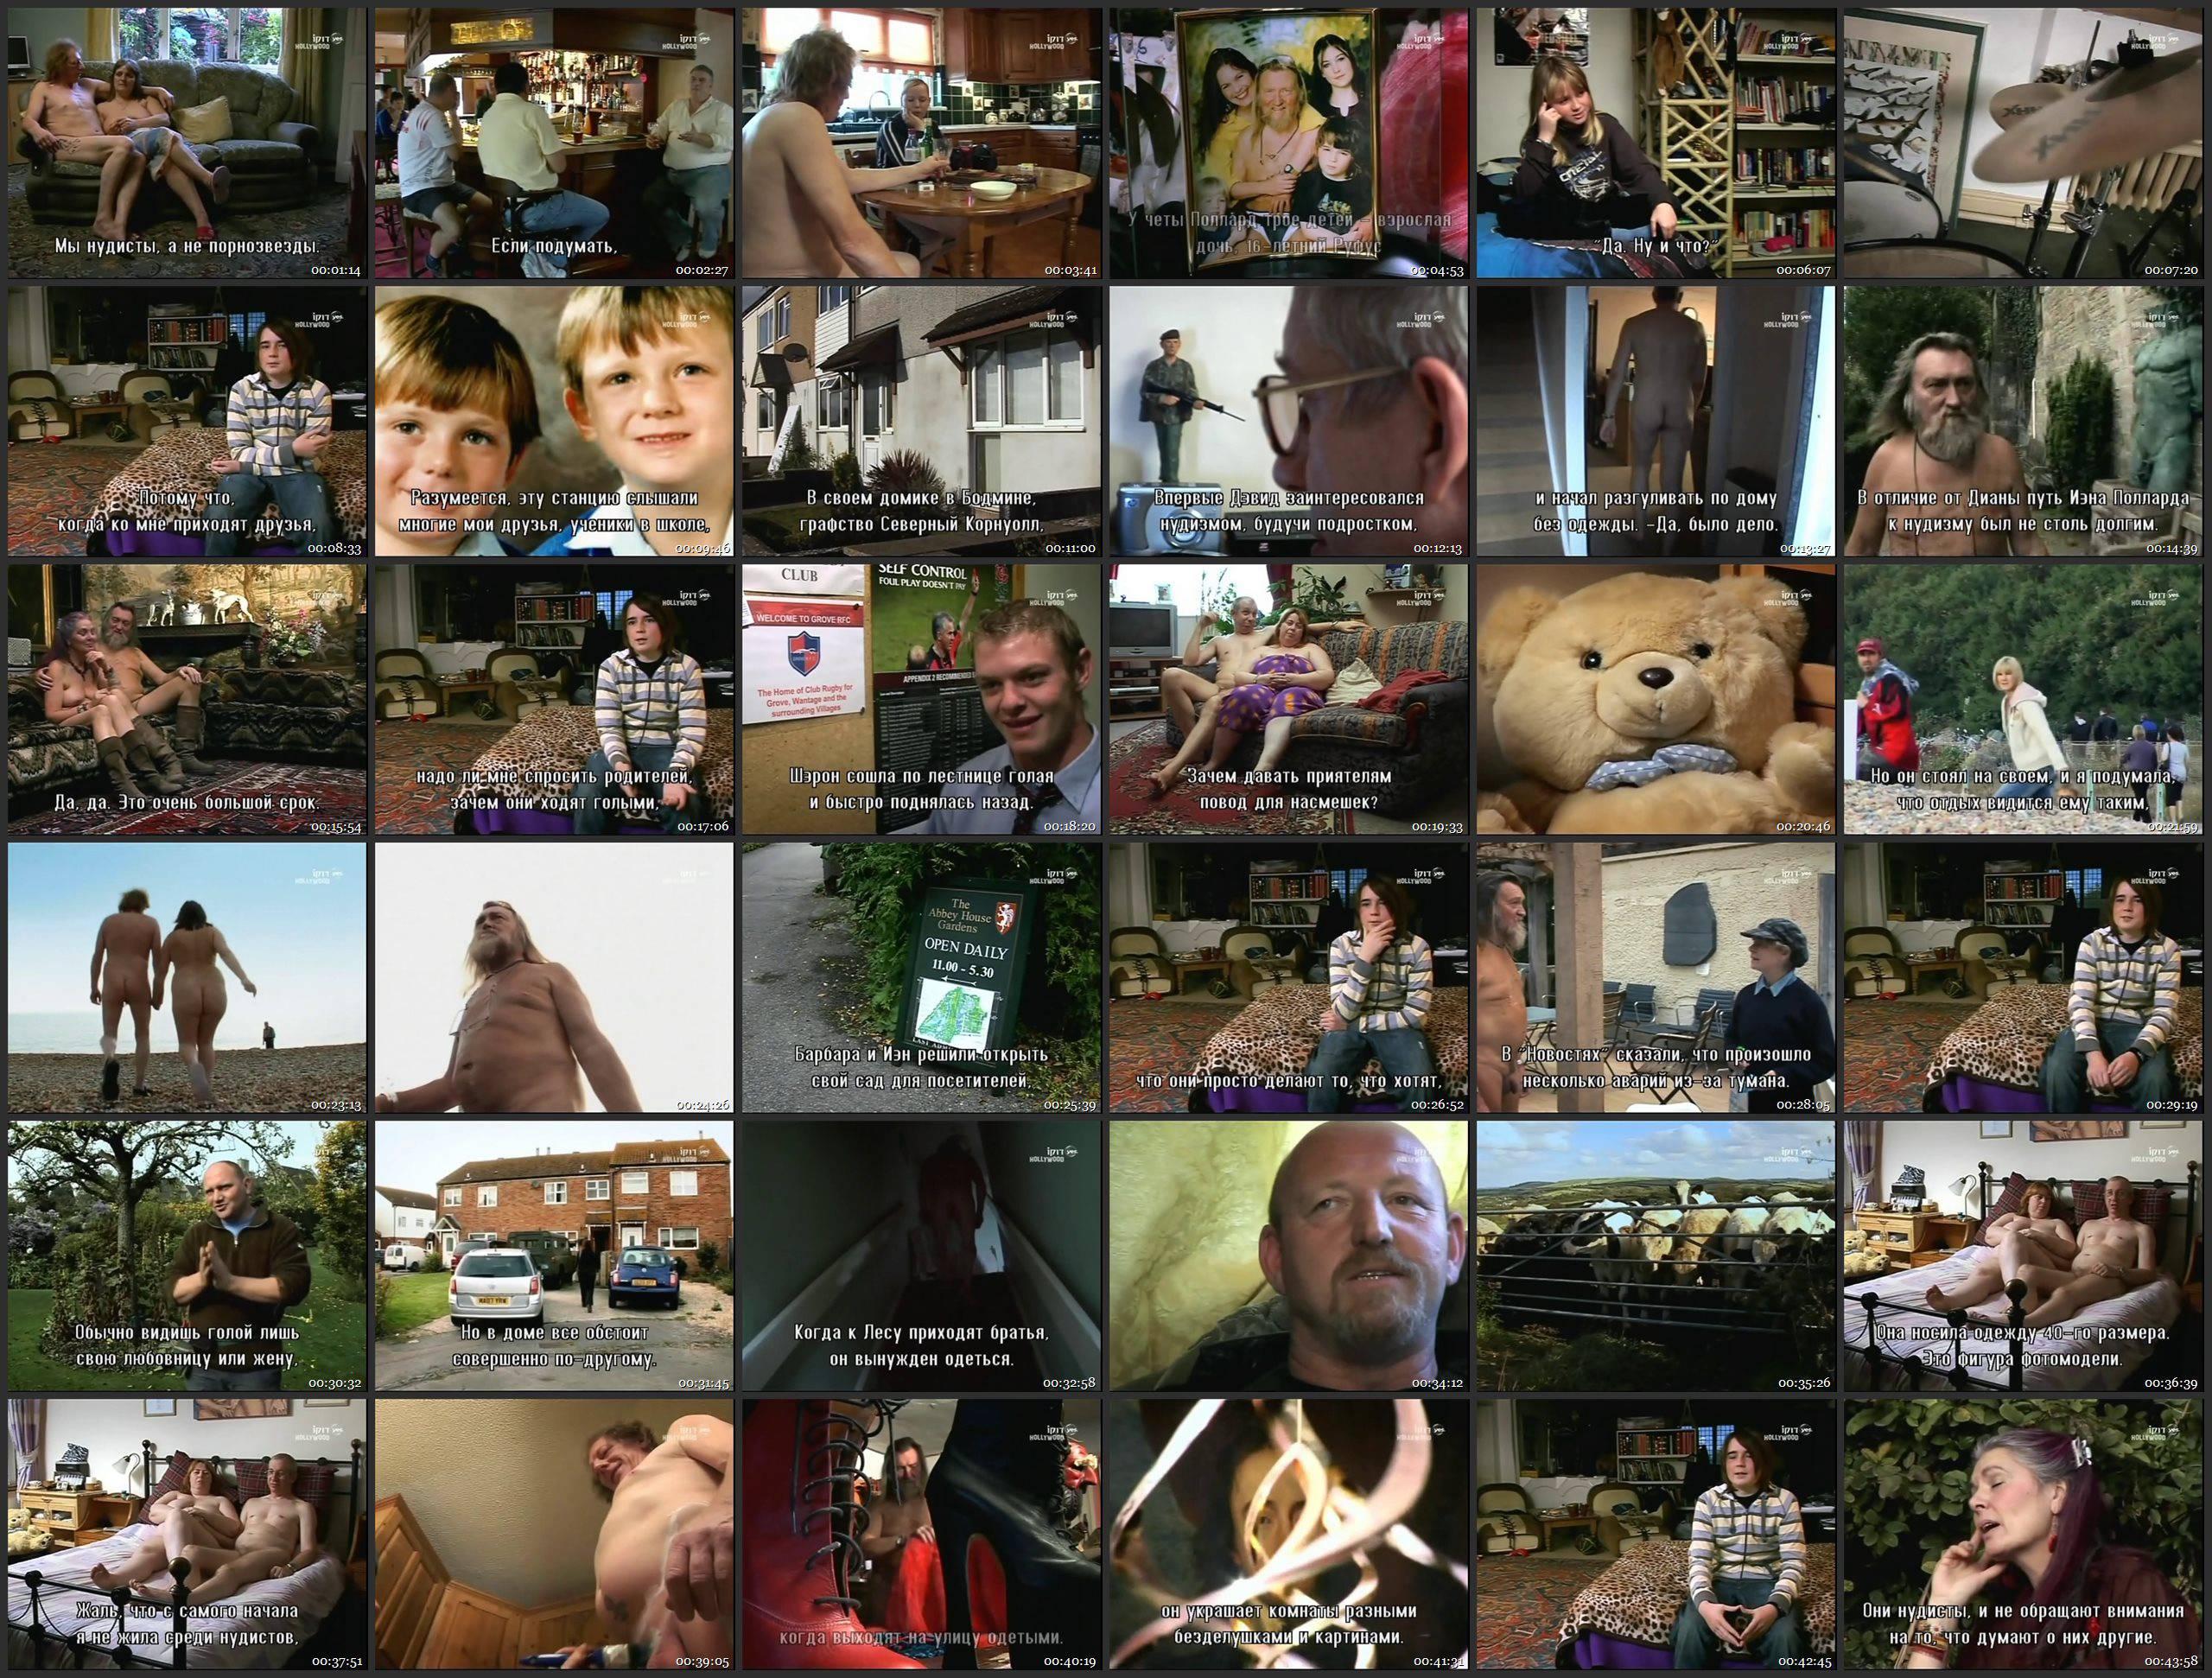 FKK Videos Naked Parents - Thumbnails